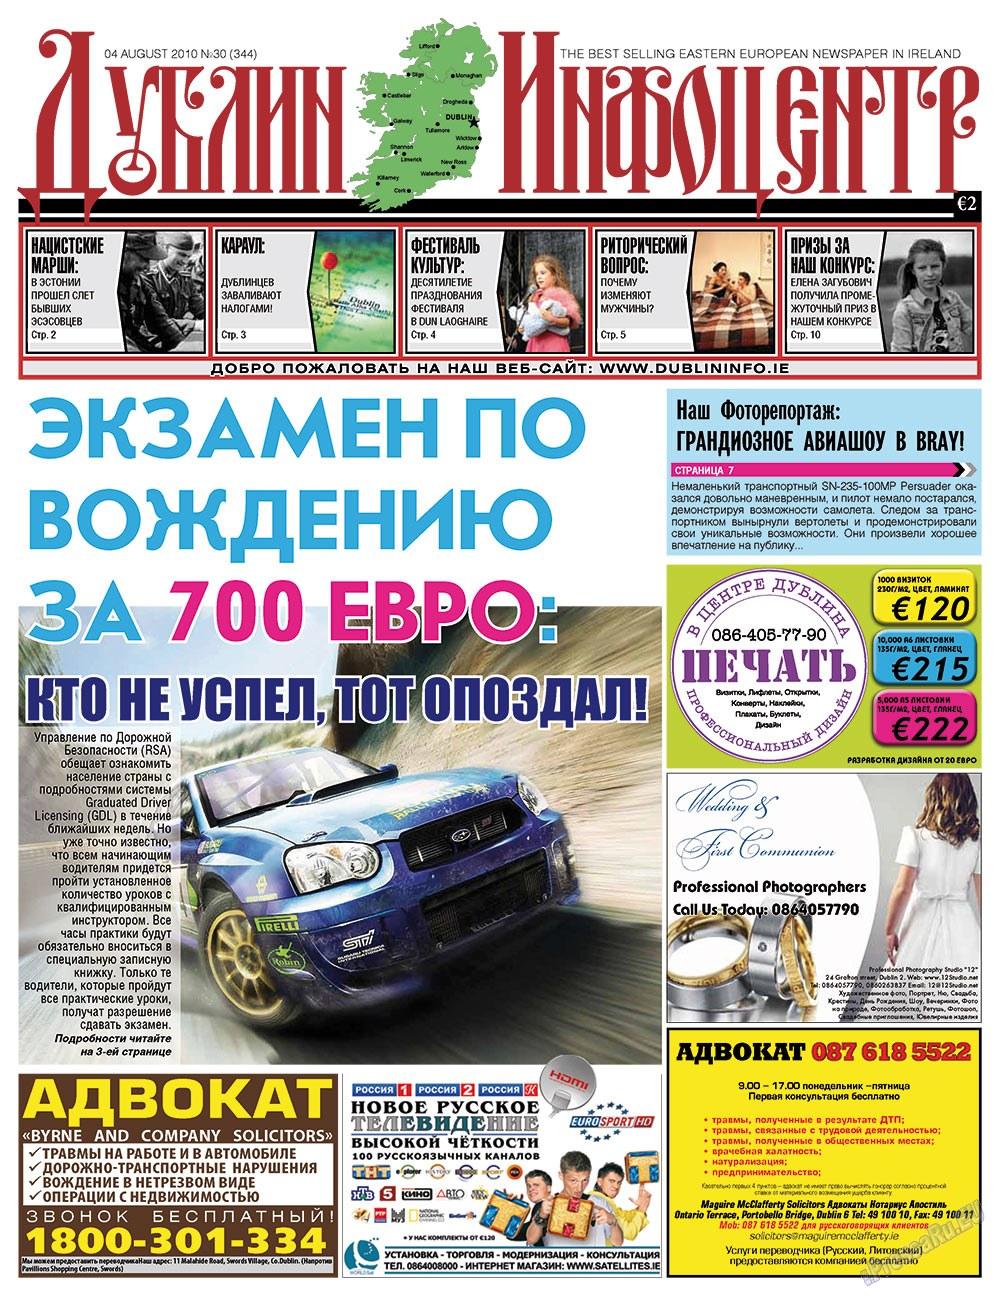 Дублин инфоцентр (газета). 2010 год, номер 30, стр. 1